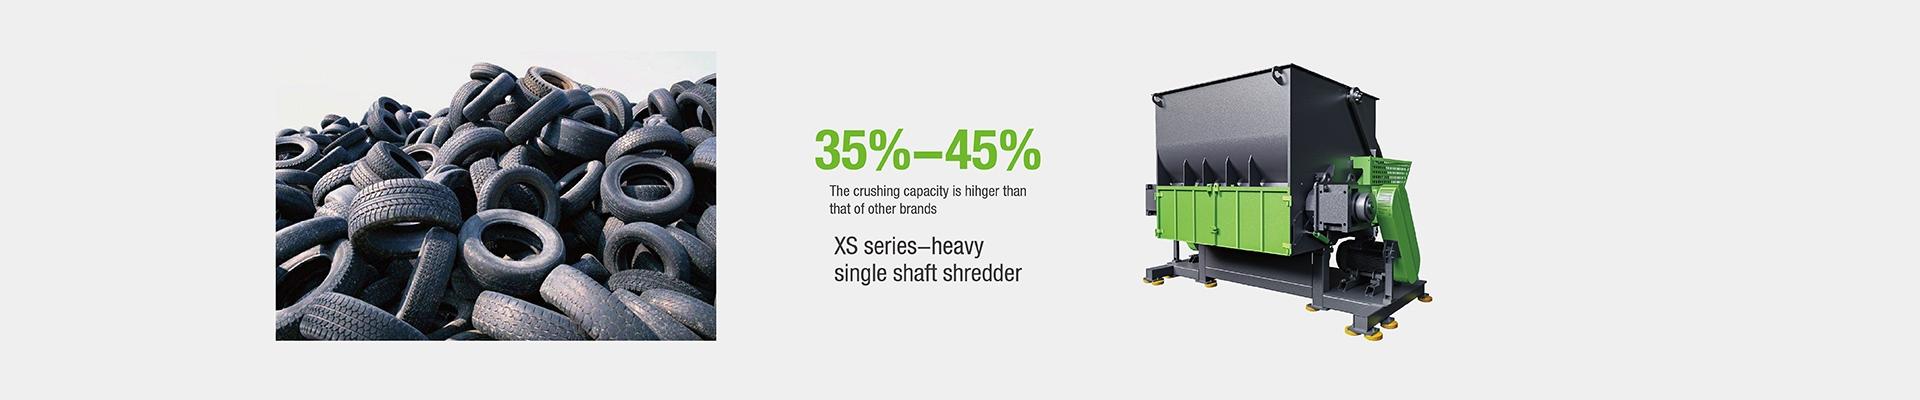 XS Series Carbon Steel Industrial Multifunctional Plastic Shredder With Siemens Plc